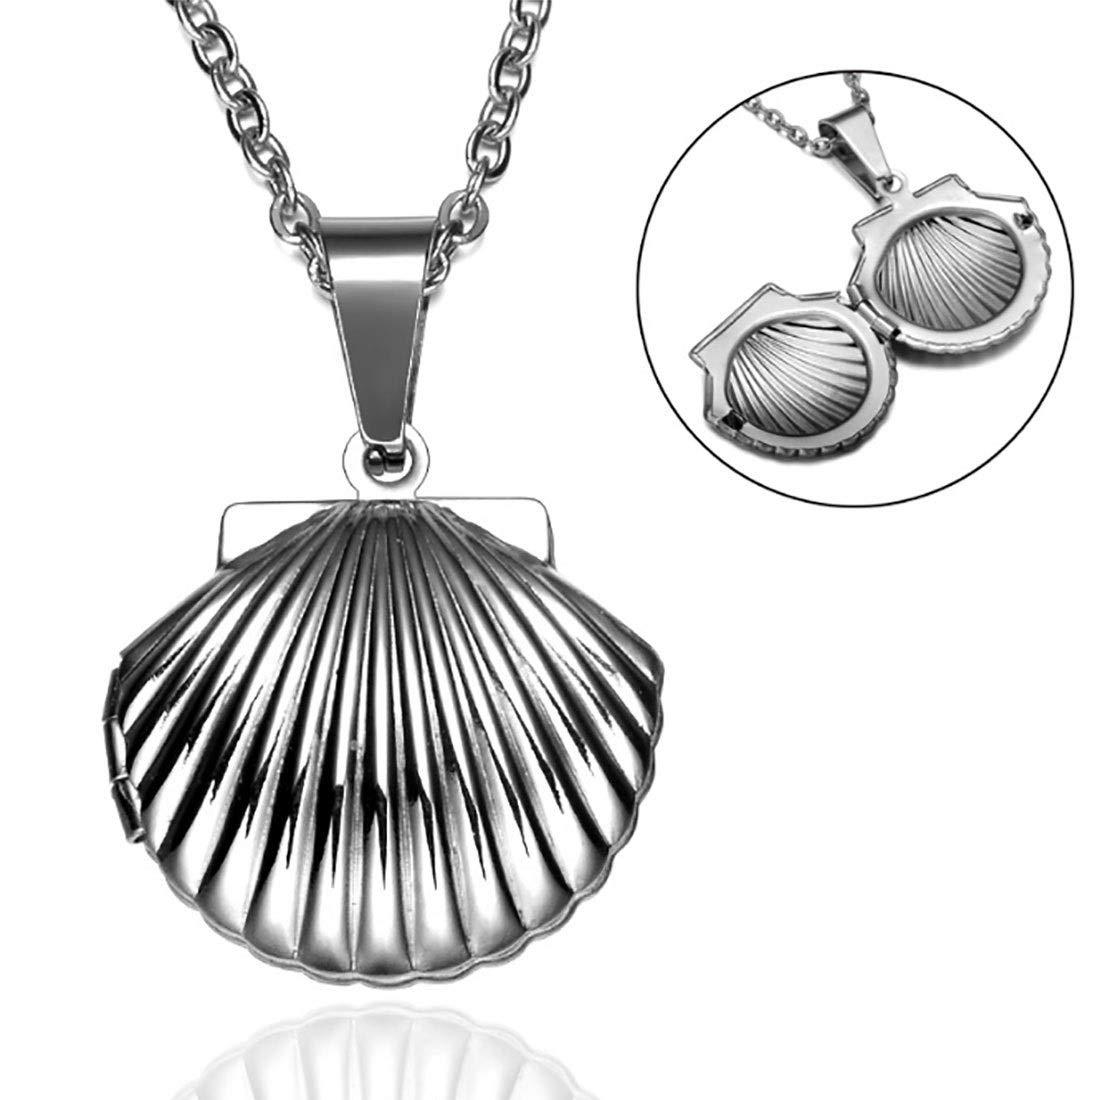 KIRLA Pendant Stainless Steel Shell Open Pendant Necklace Pendant Necklace 2.2 2.3cm